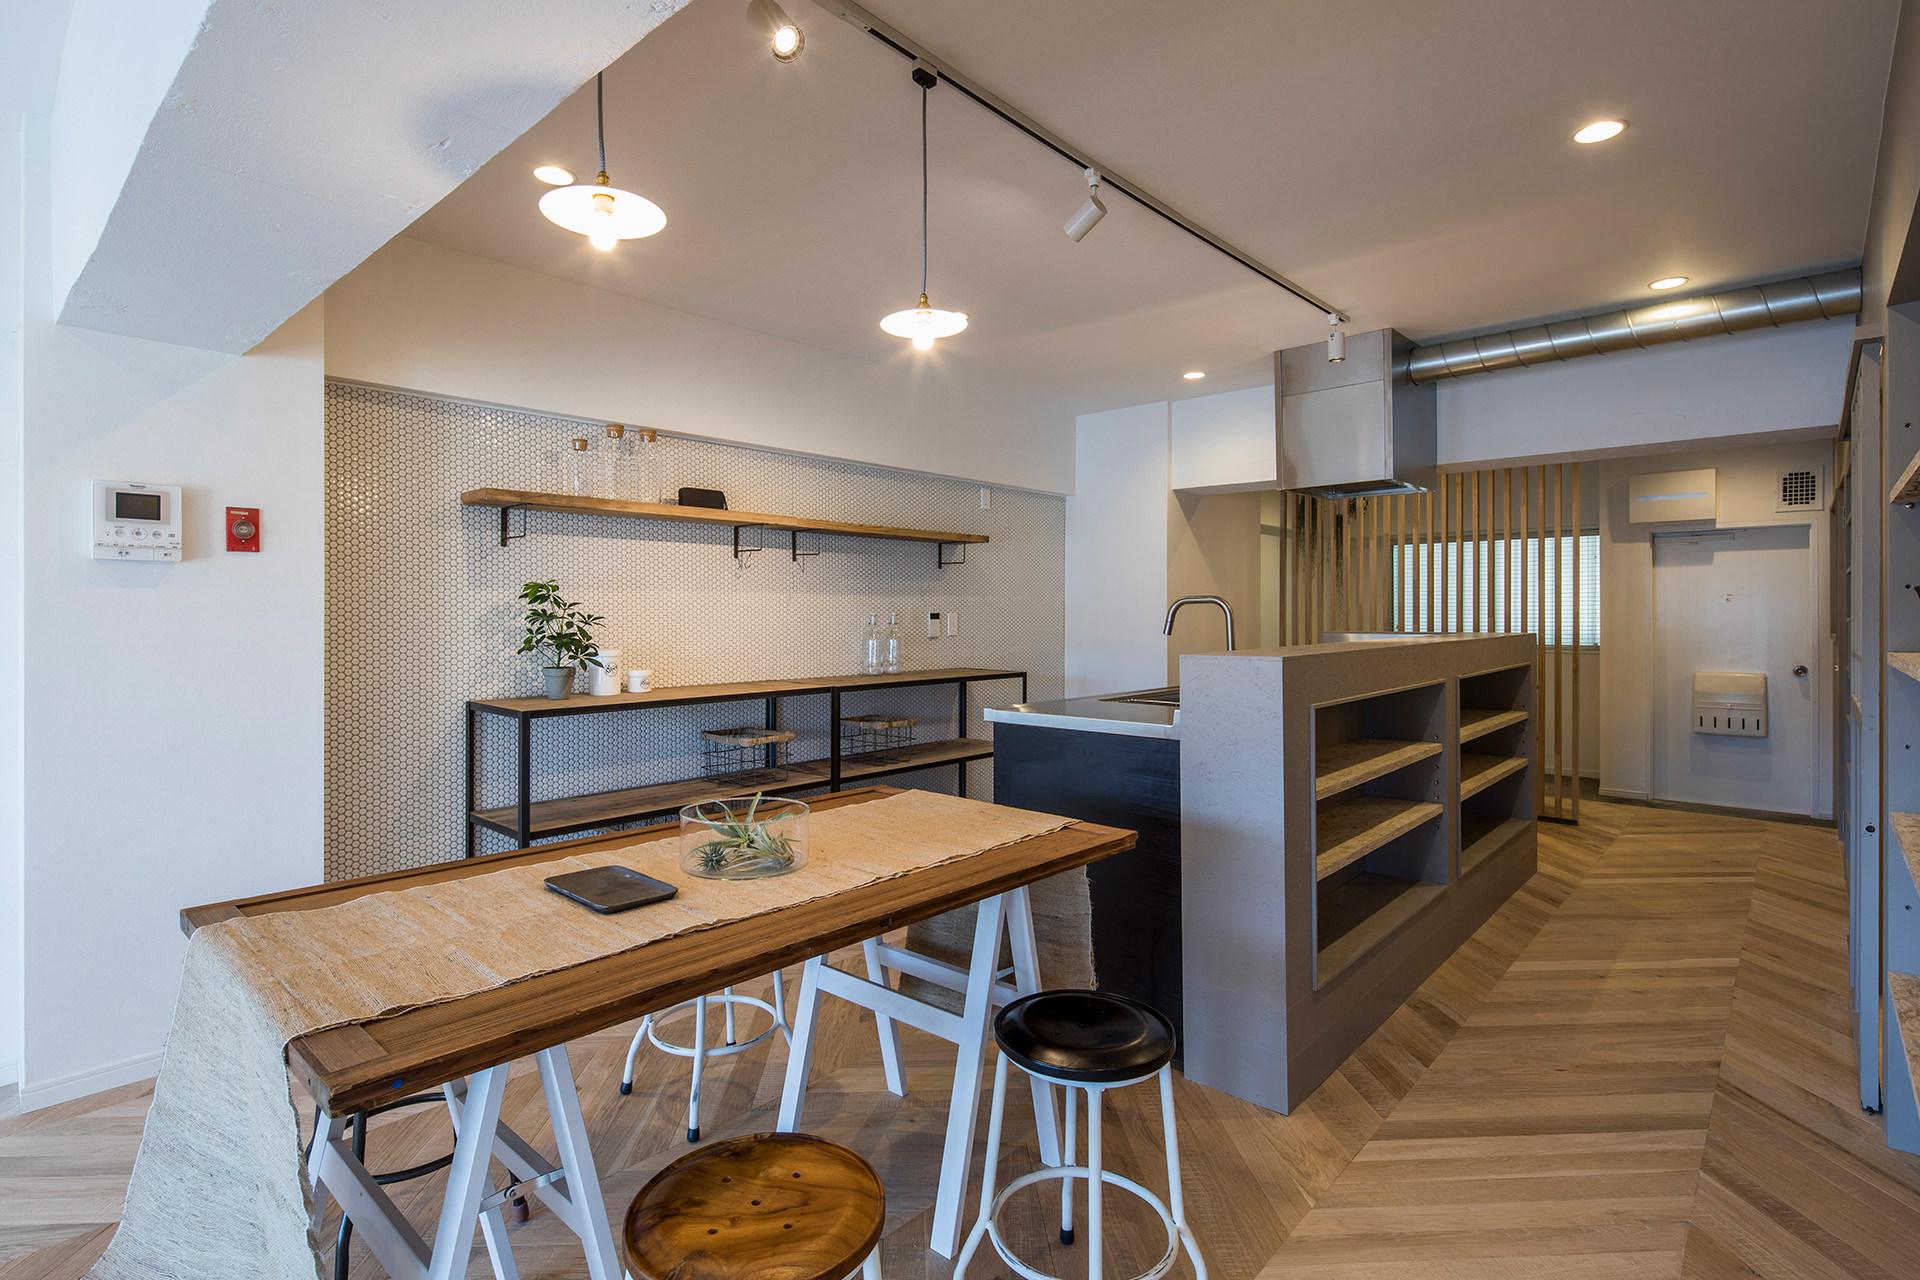 stri-ep house* flat 葉山エコーハイツ  イメージ11 撮影:東涌写真事務所・東涌宏和